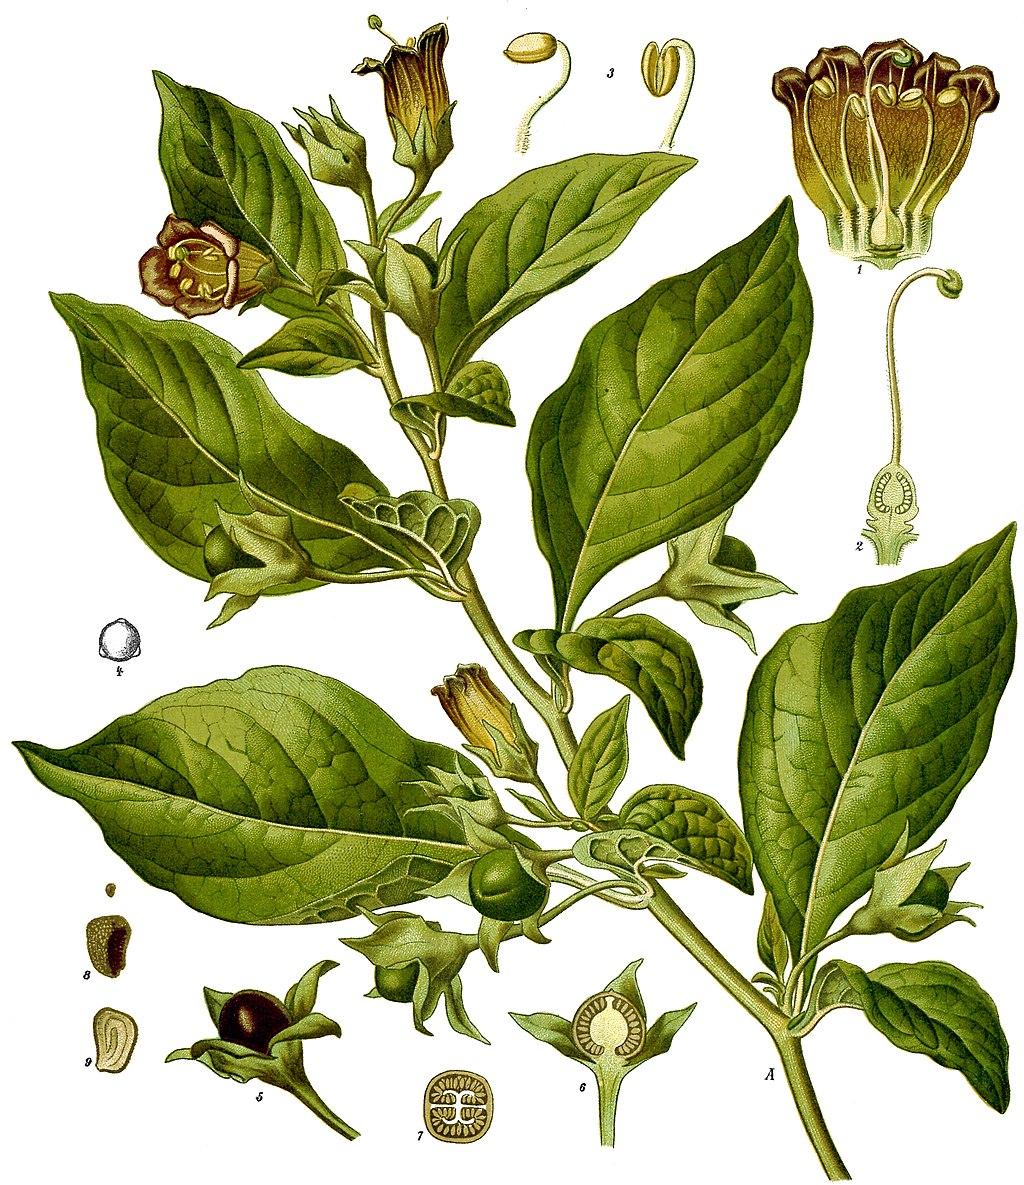 Atropa bella-donna